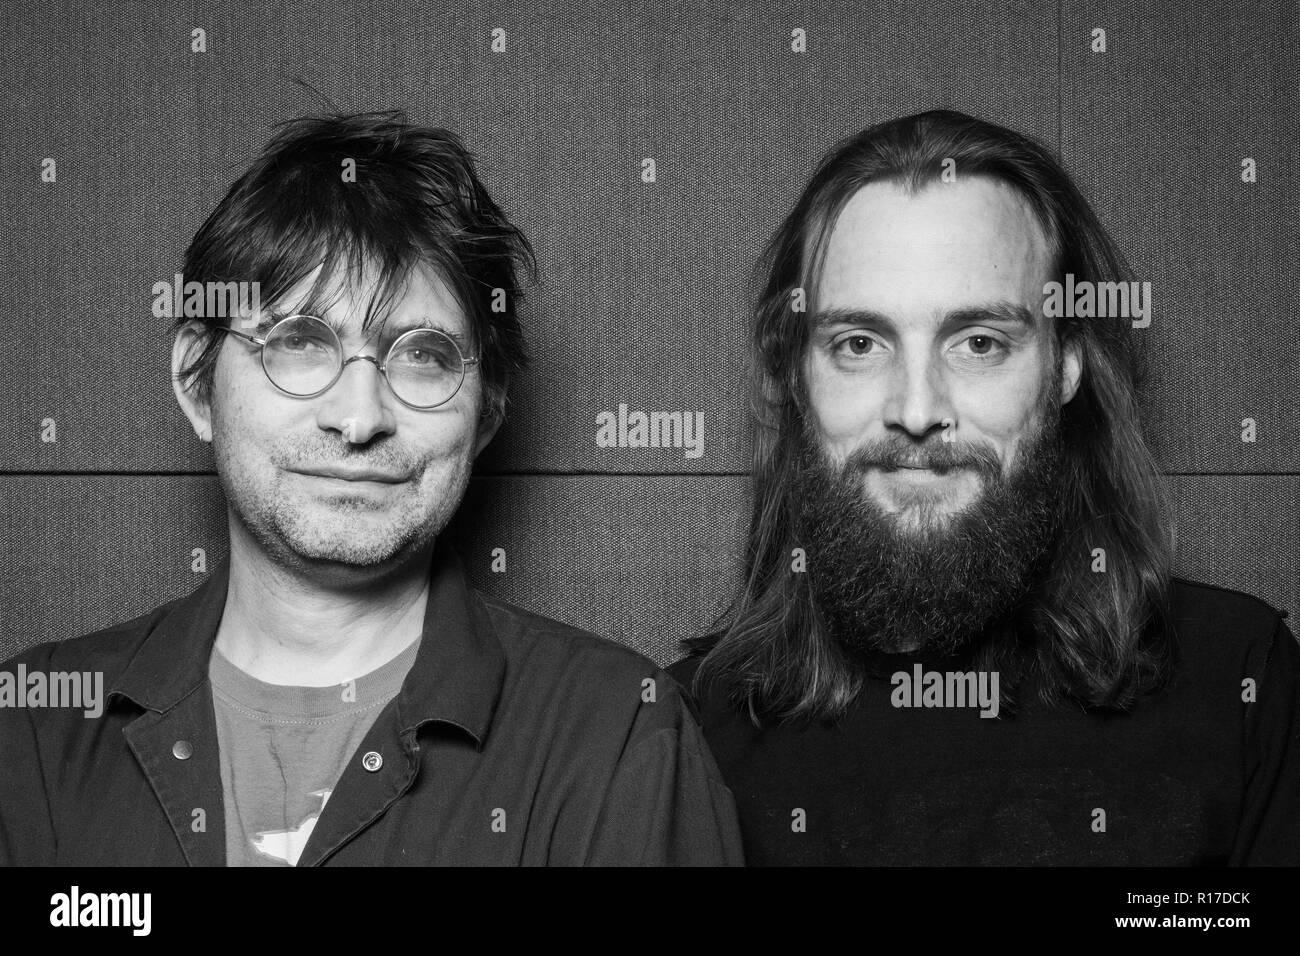 Steve Albini and John Grabski III at Electrical Audio recording studio in Chicago. - Stock Image